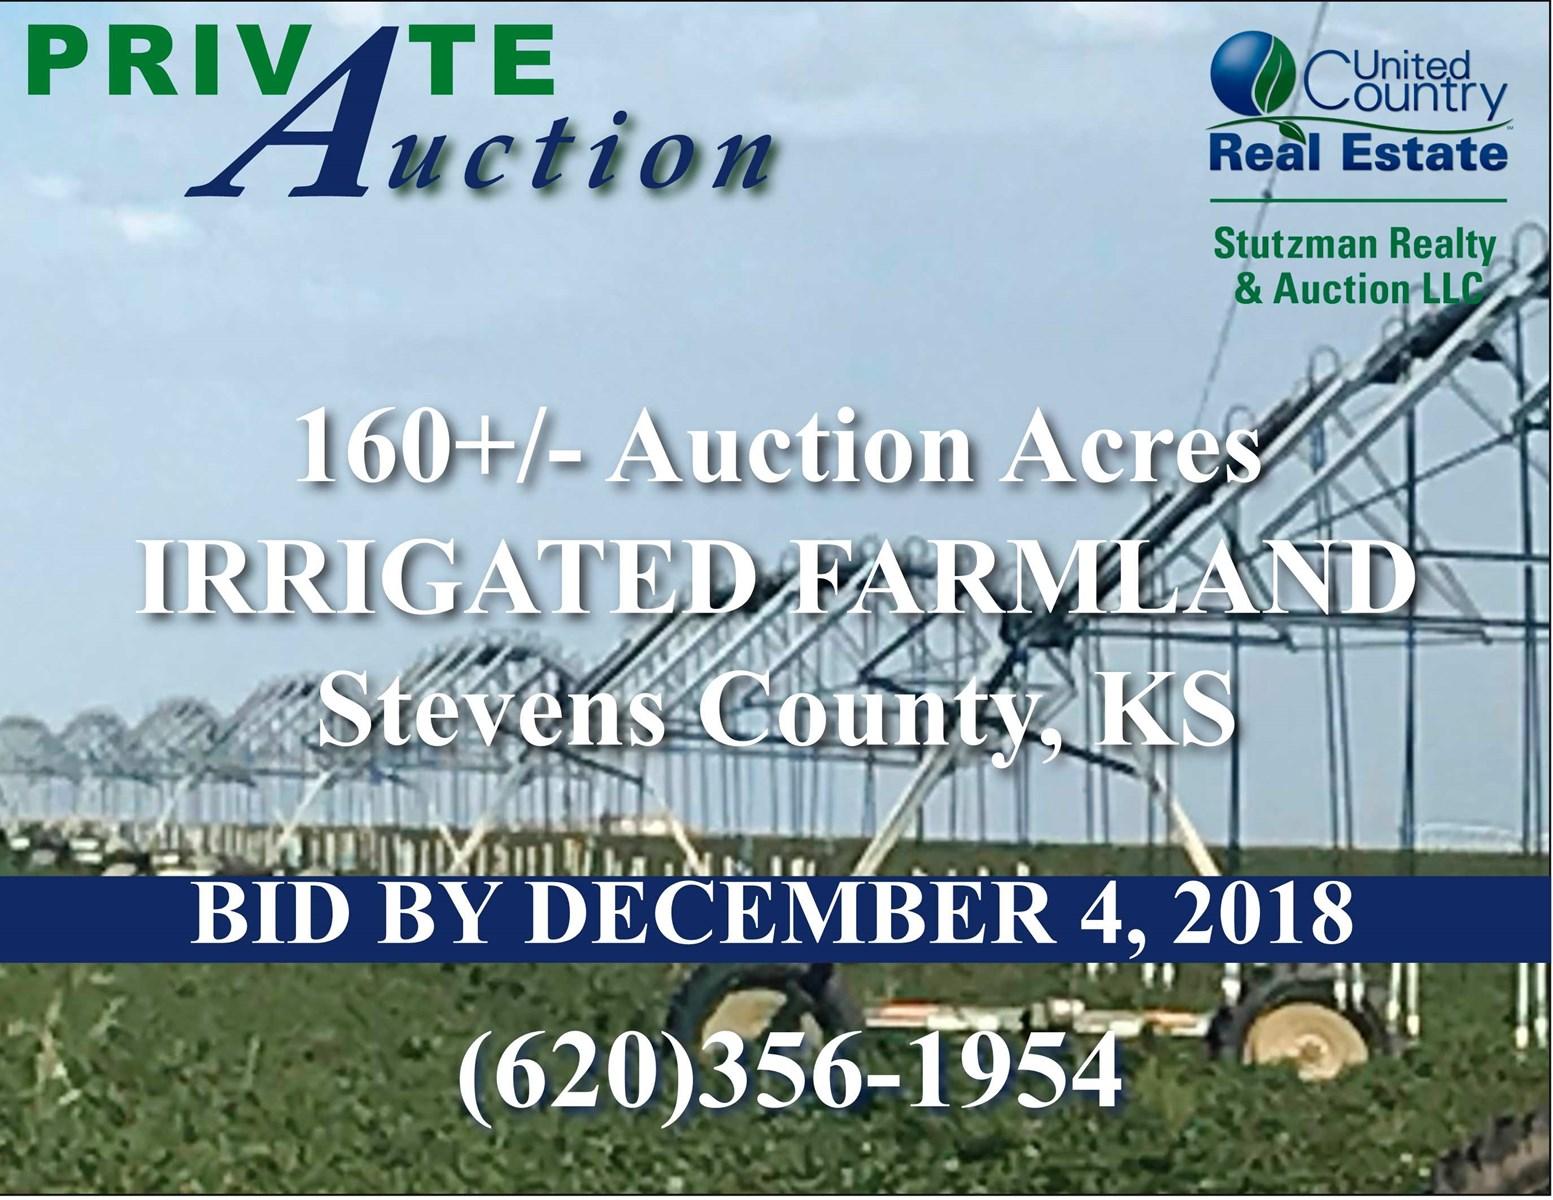 160+/- ACRES OF IRRIGATED FARMLAND - STEVENS COUNTY, KANSAS